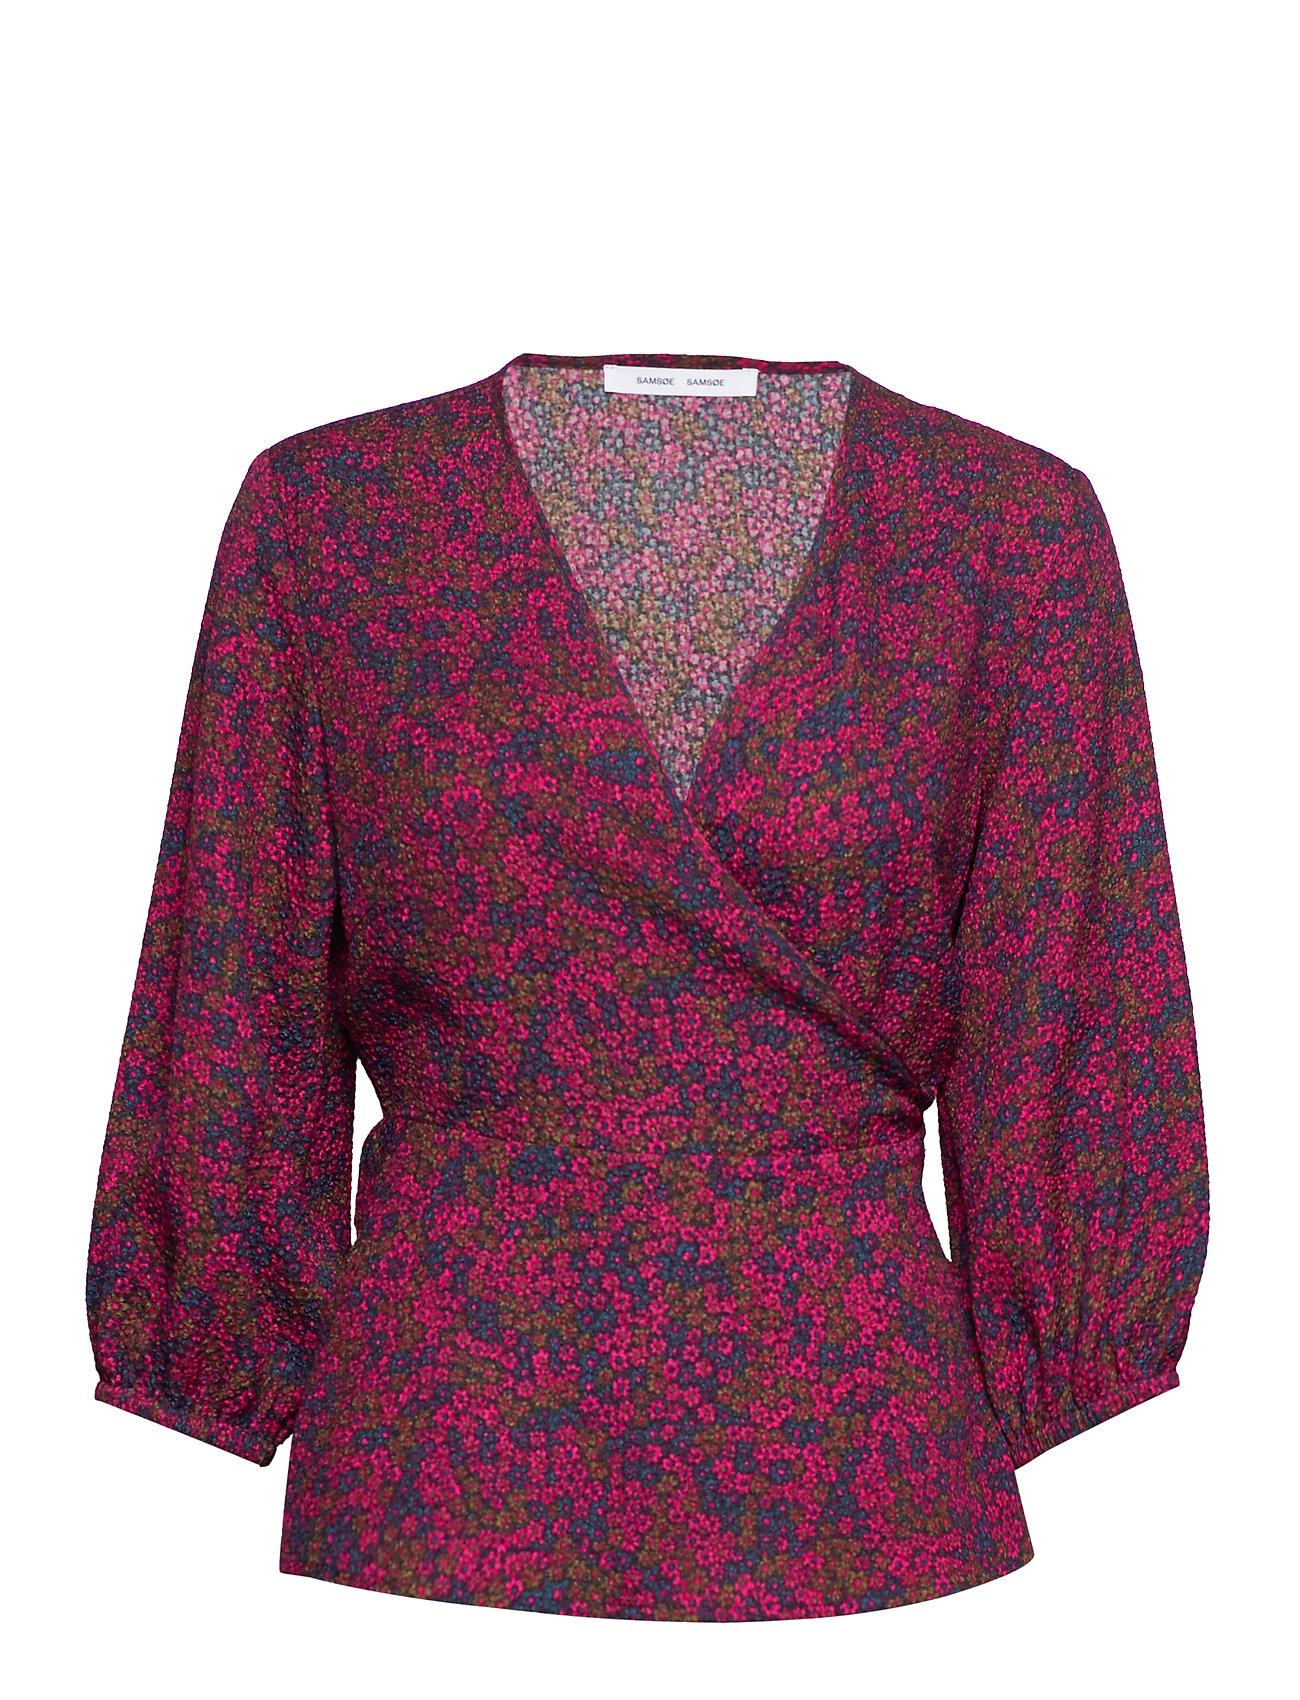 Samsøe & Samsøe Veneta blouse aop 7947 - MOONLIGHT FLOWER